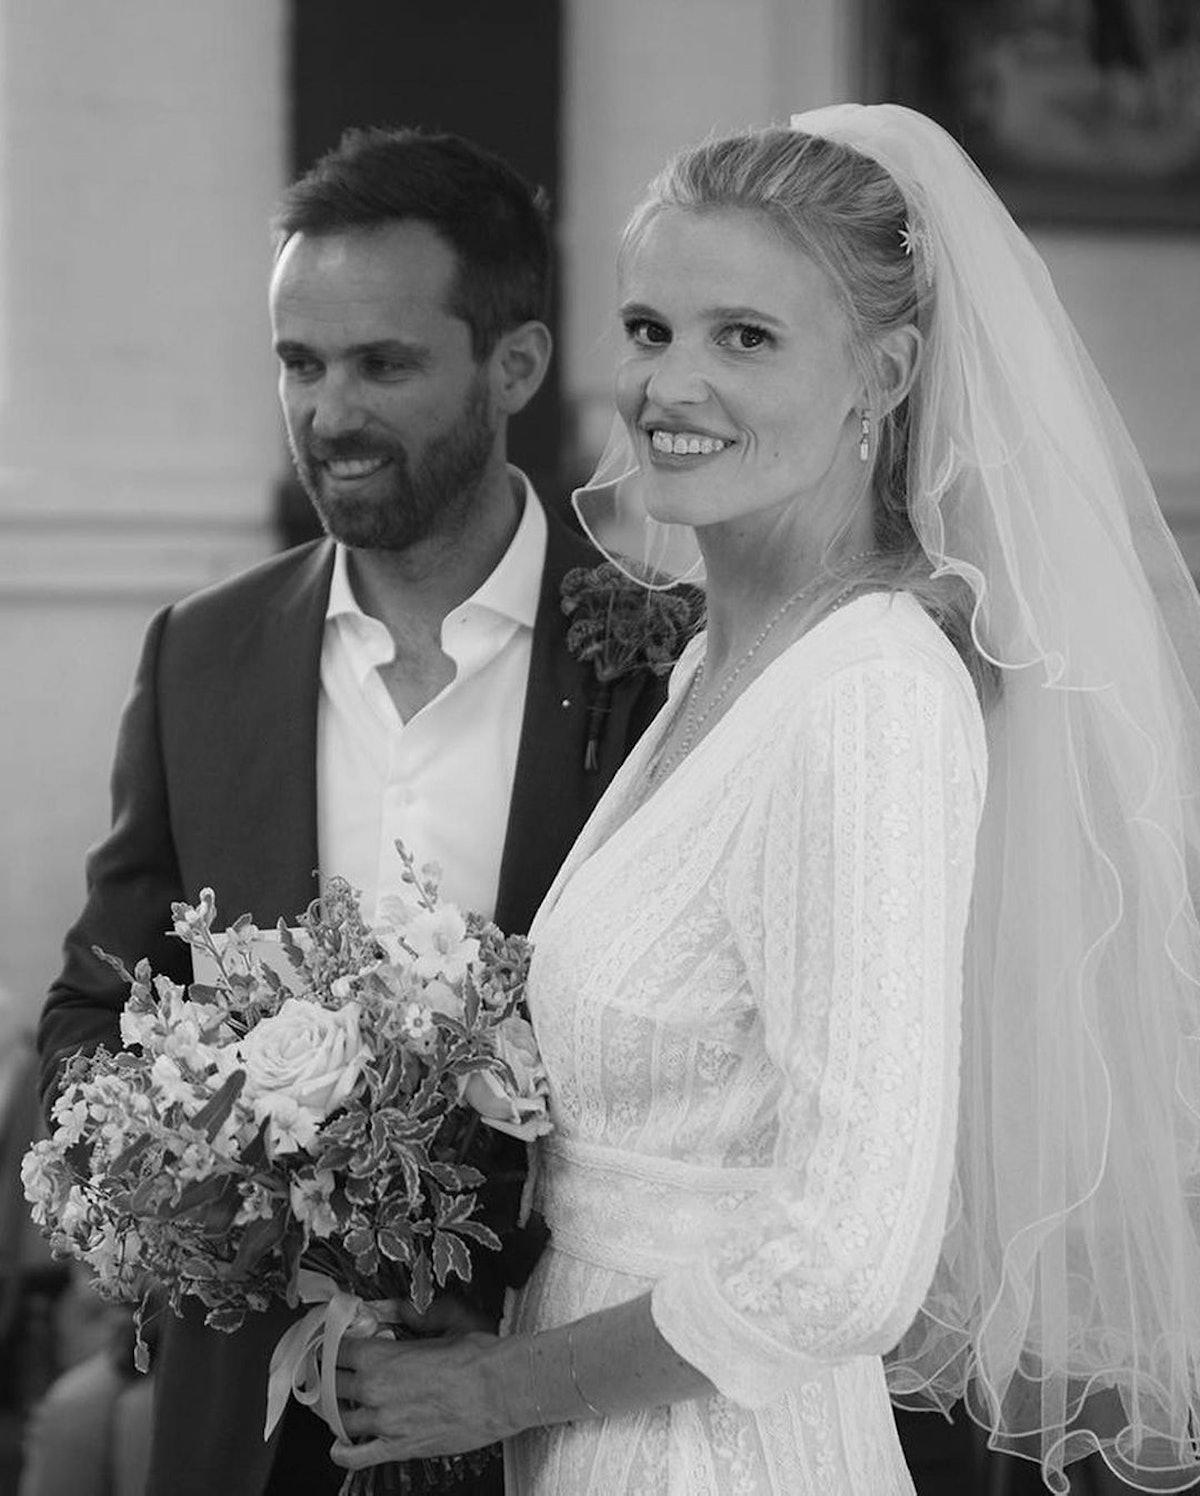 David Grievson and Lara Stone